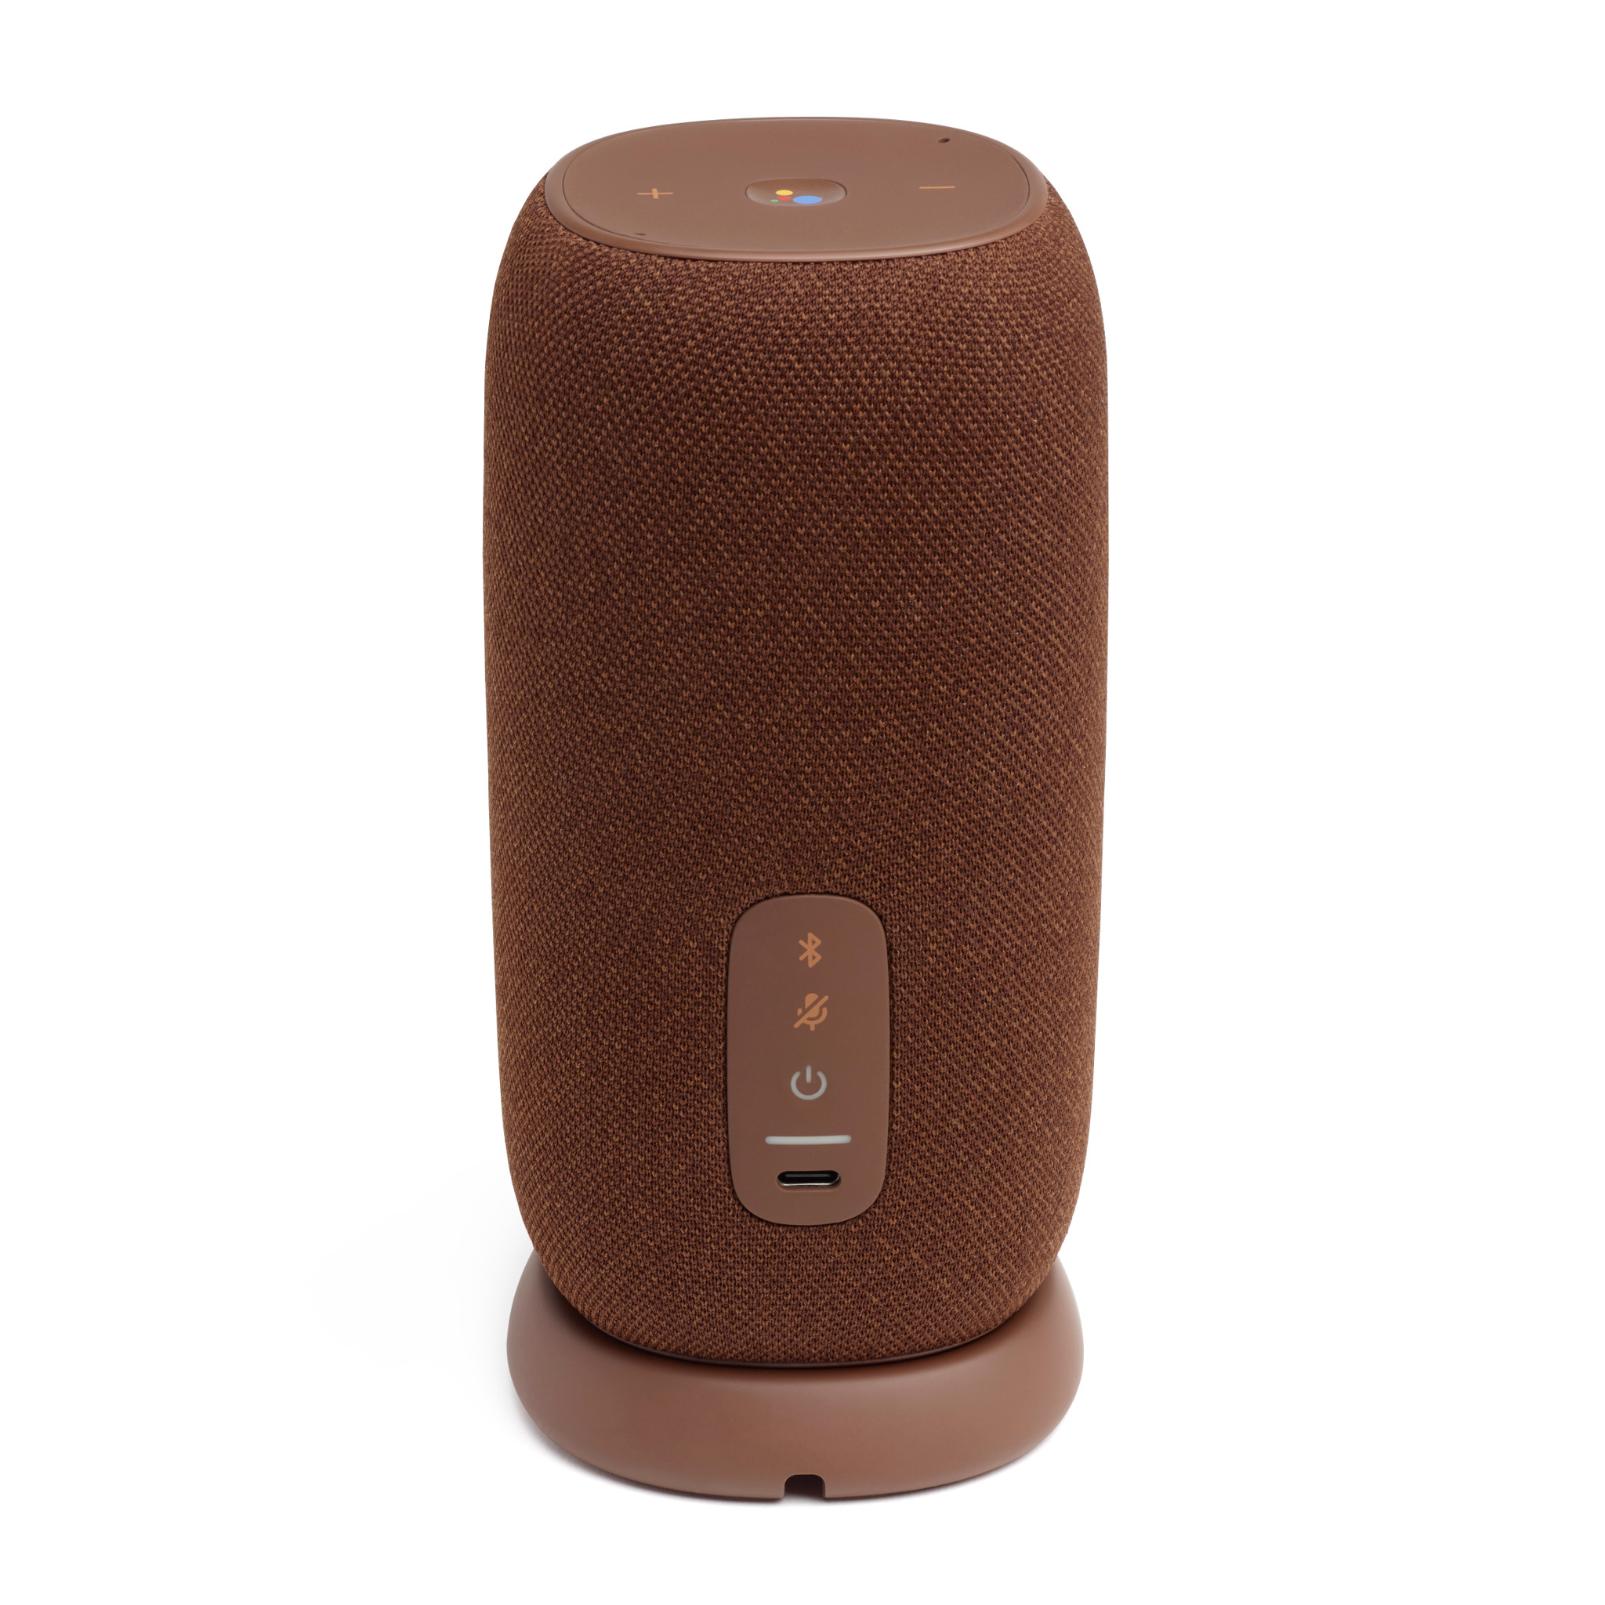 JBL Link Portable - Brown - Portable Wi-Fi Speaker - Back